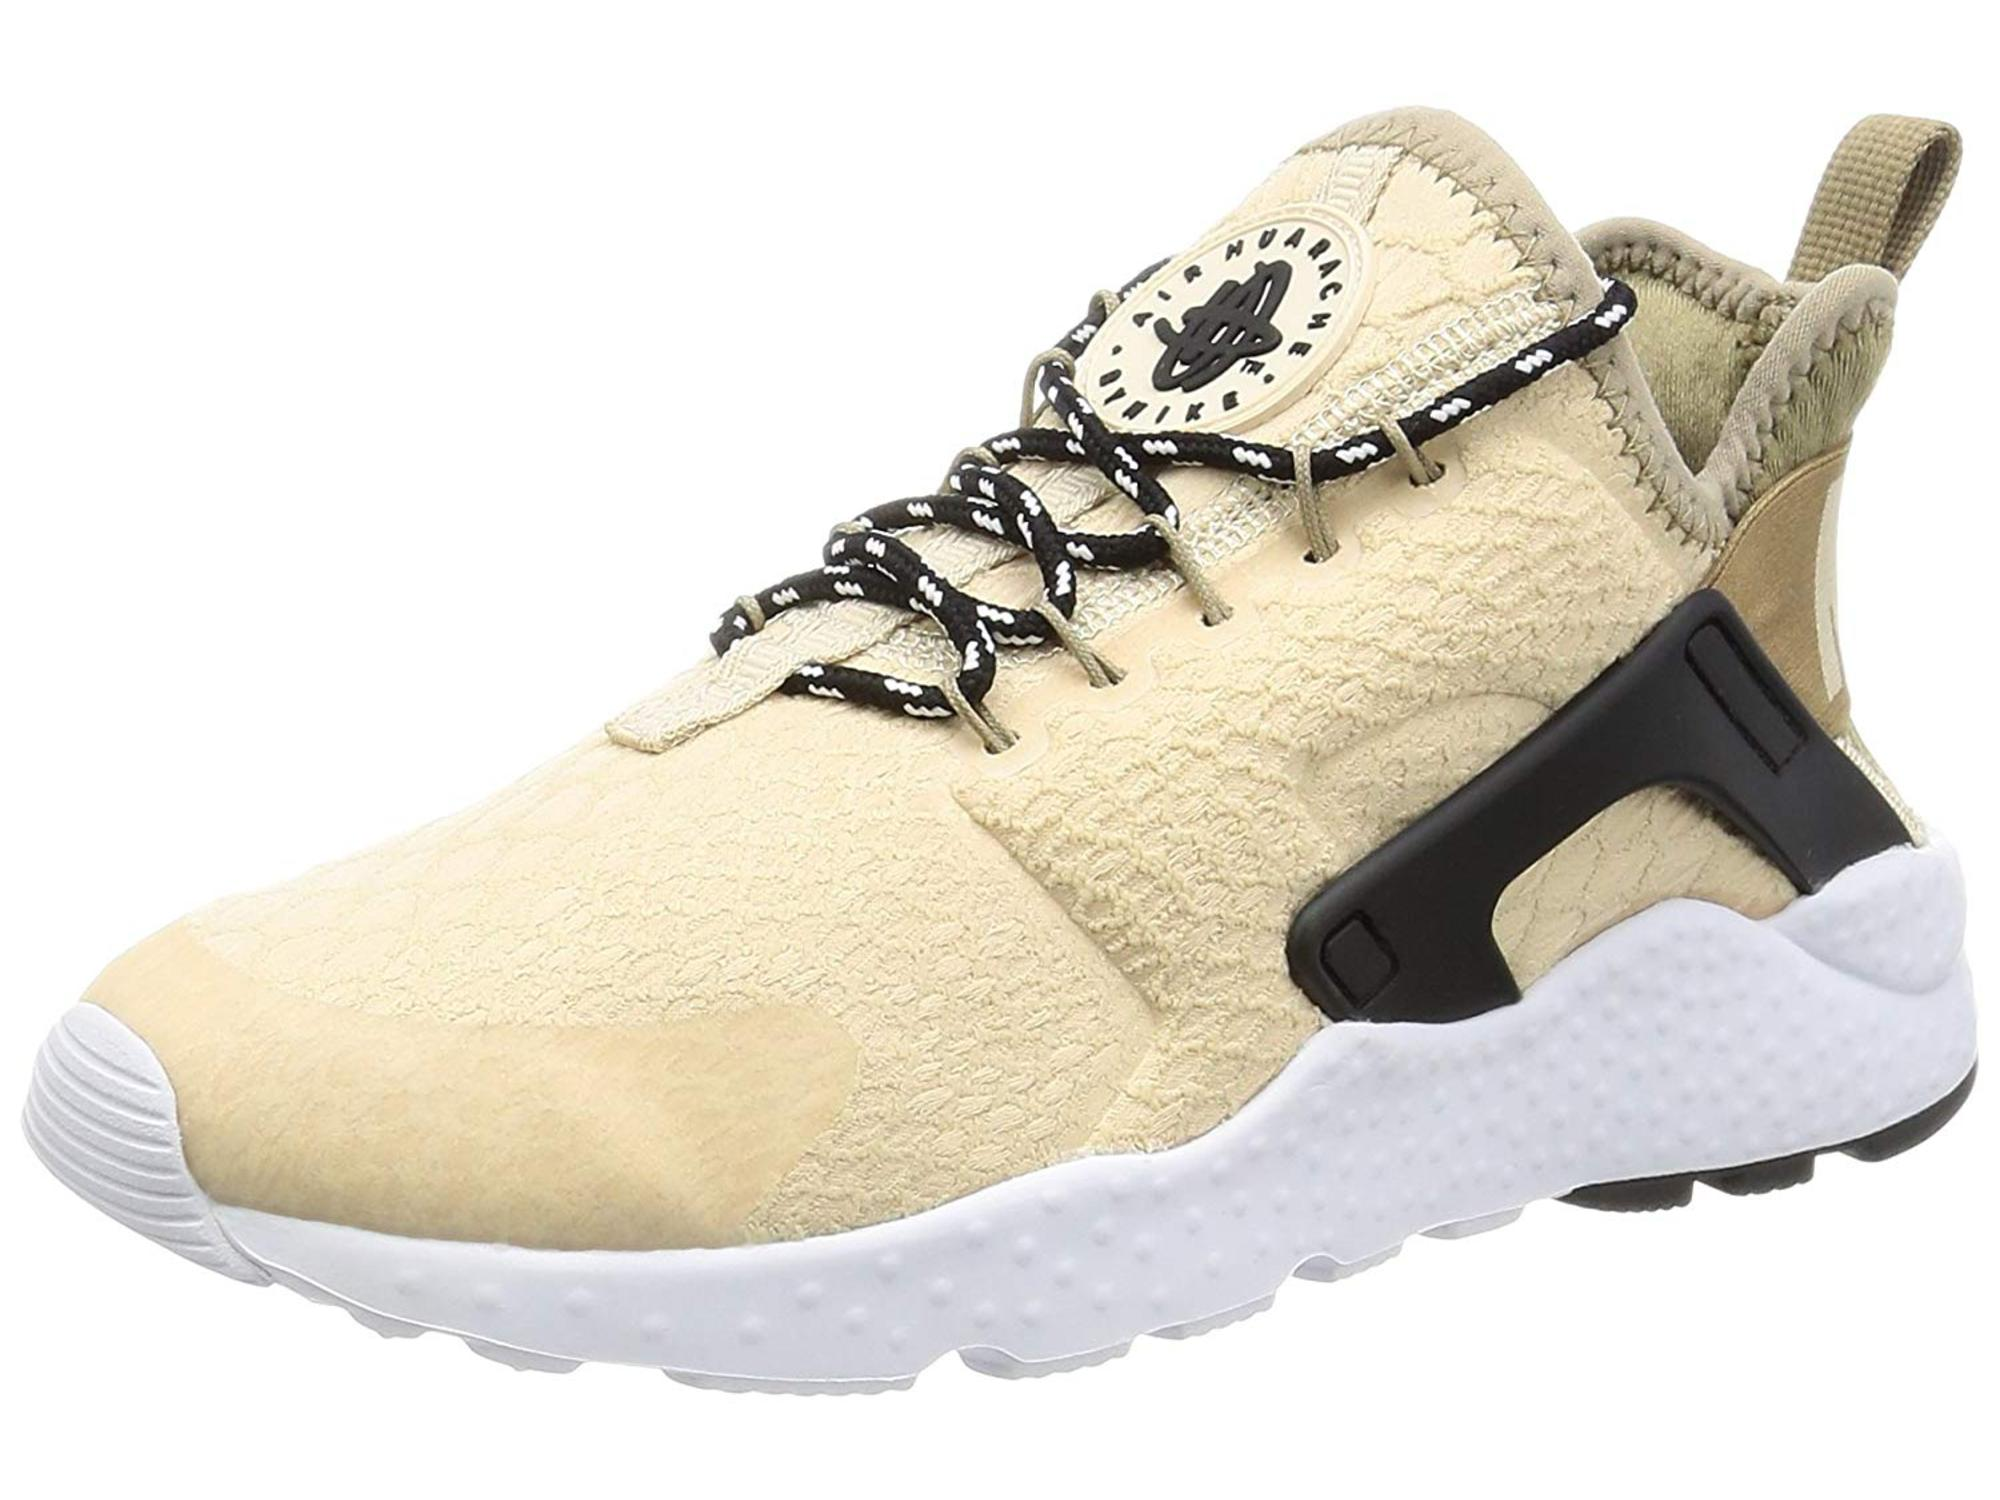 Nike Womens Air Huarache Run Ultra Low Top Lace Up ec69a5a35